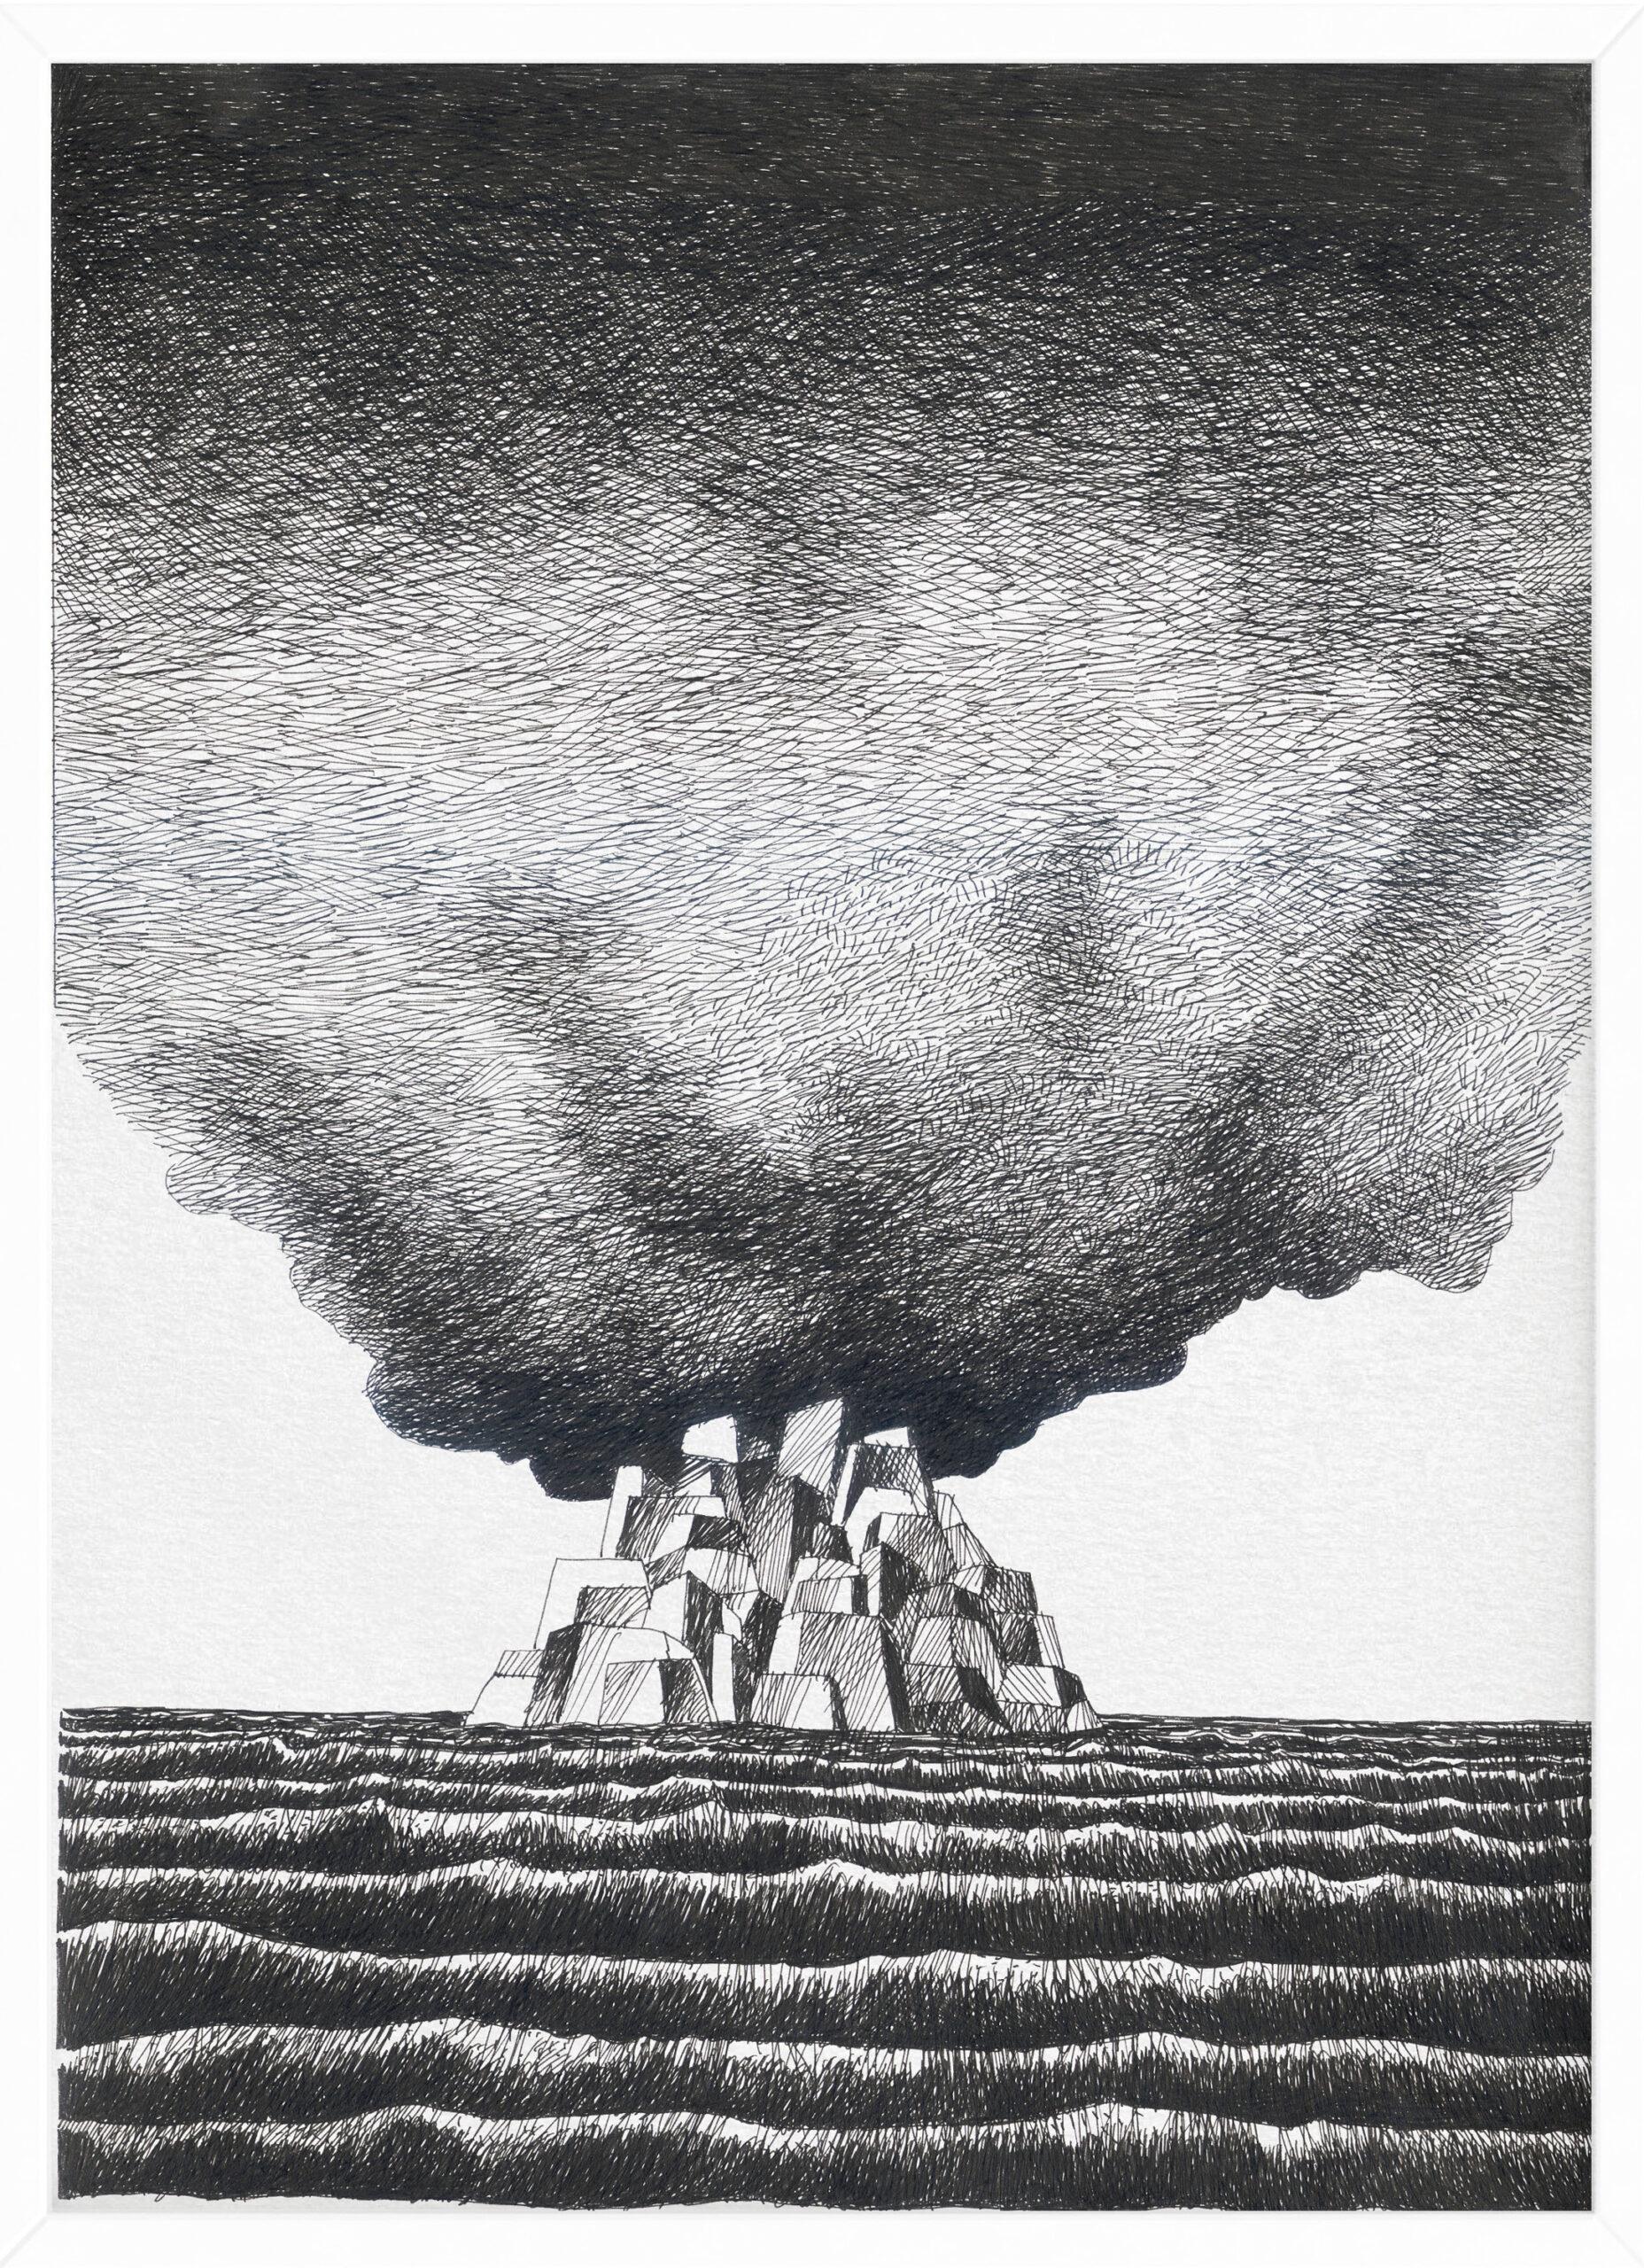 Neverland   Drawings   Mario Trimarchi Design2